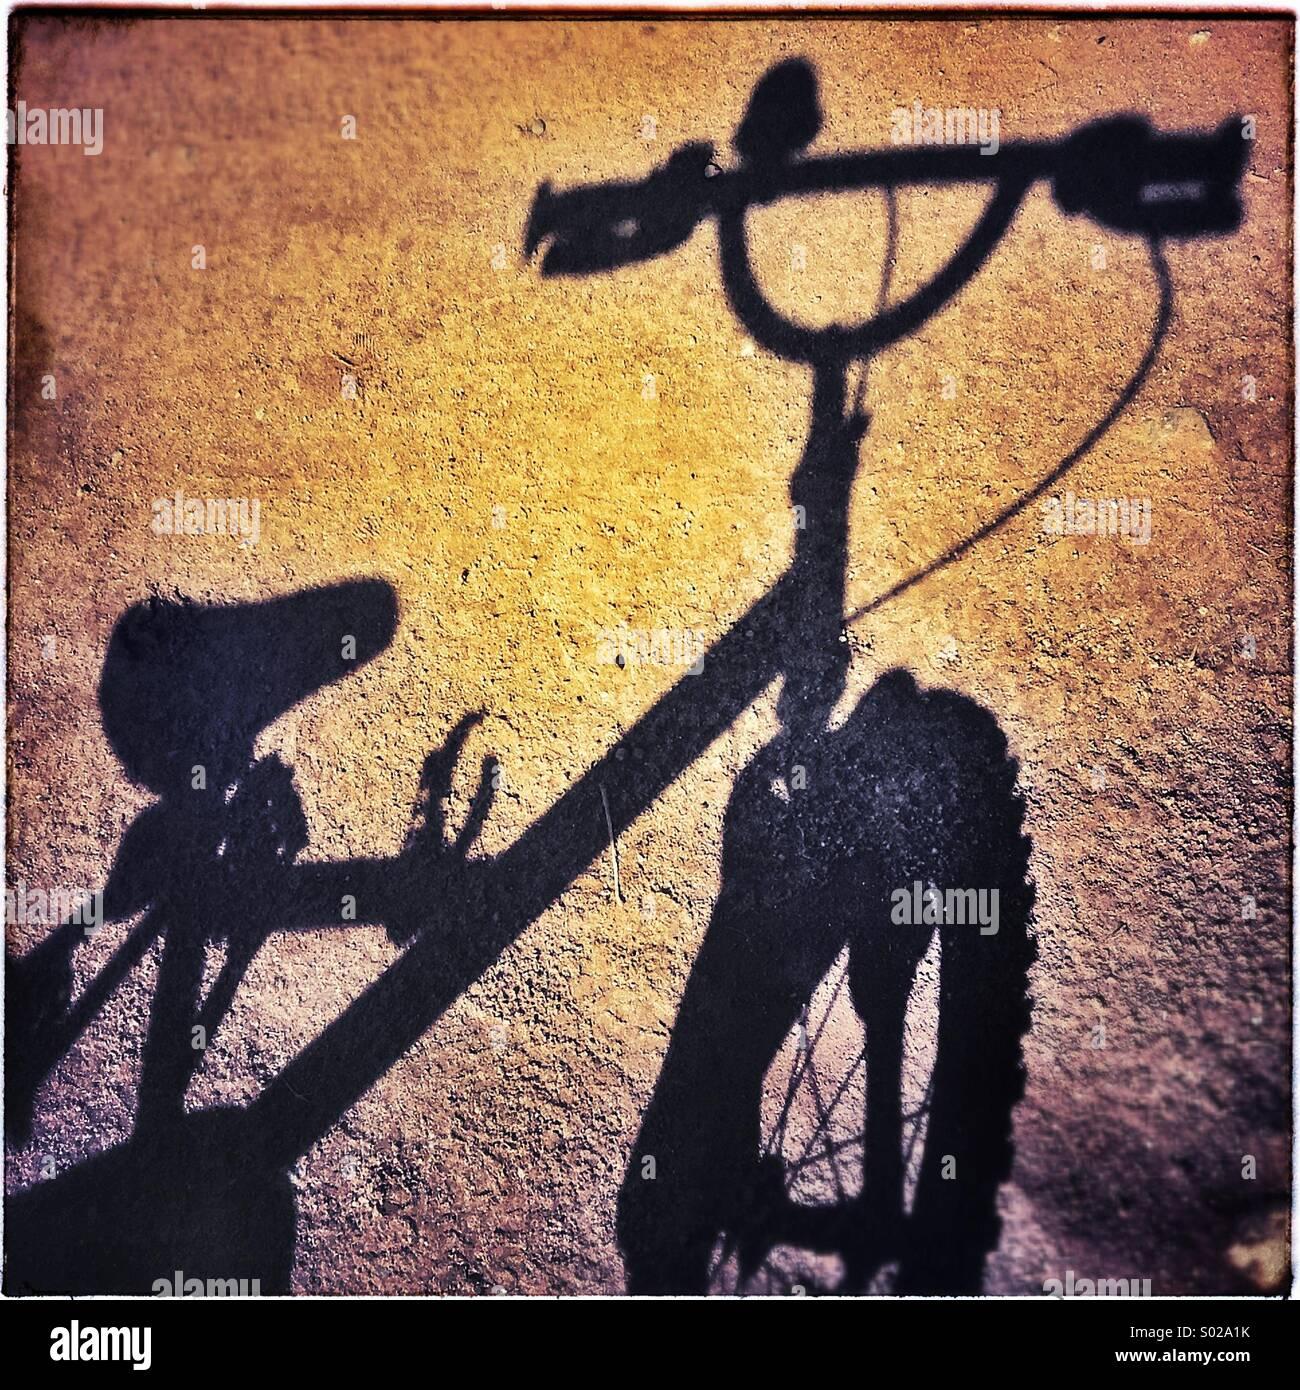 Bicycle shadow on sunday morning - Stock Image